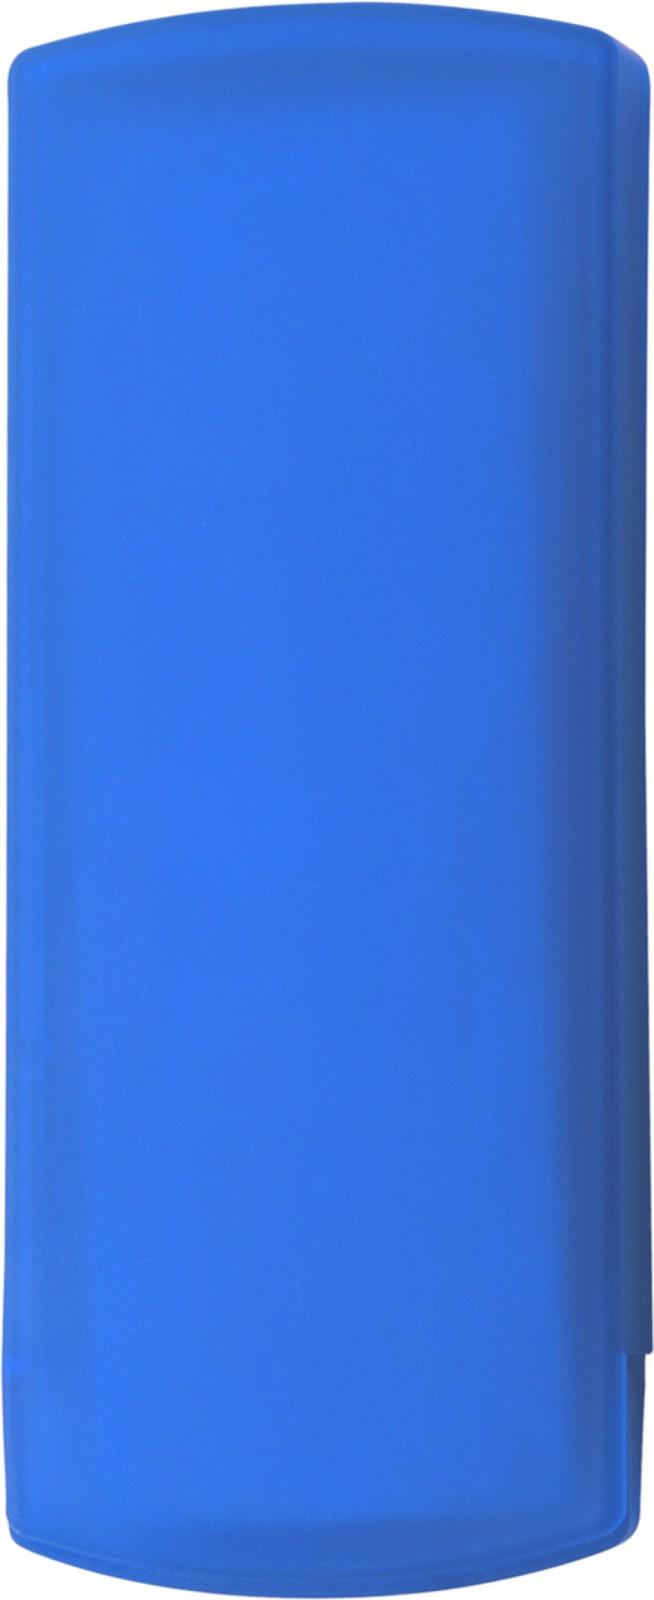 Plastic case with plasters - Cobalt Blue